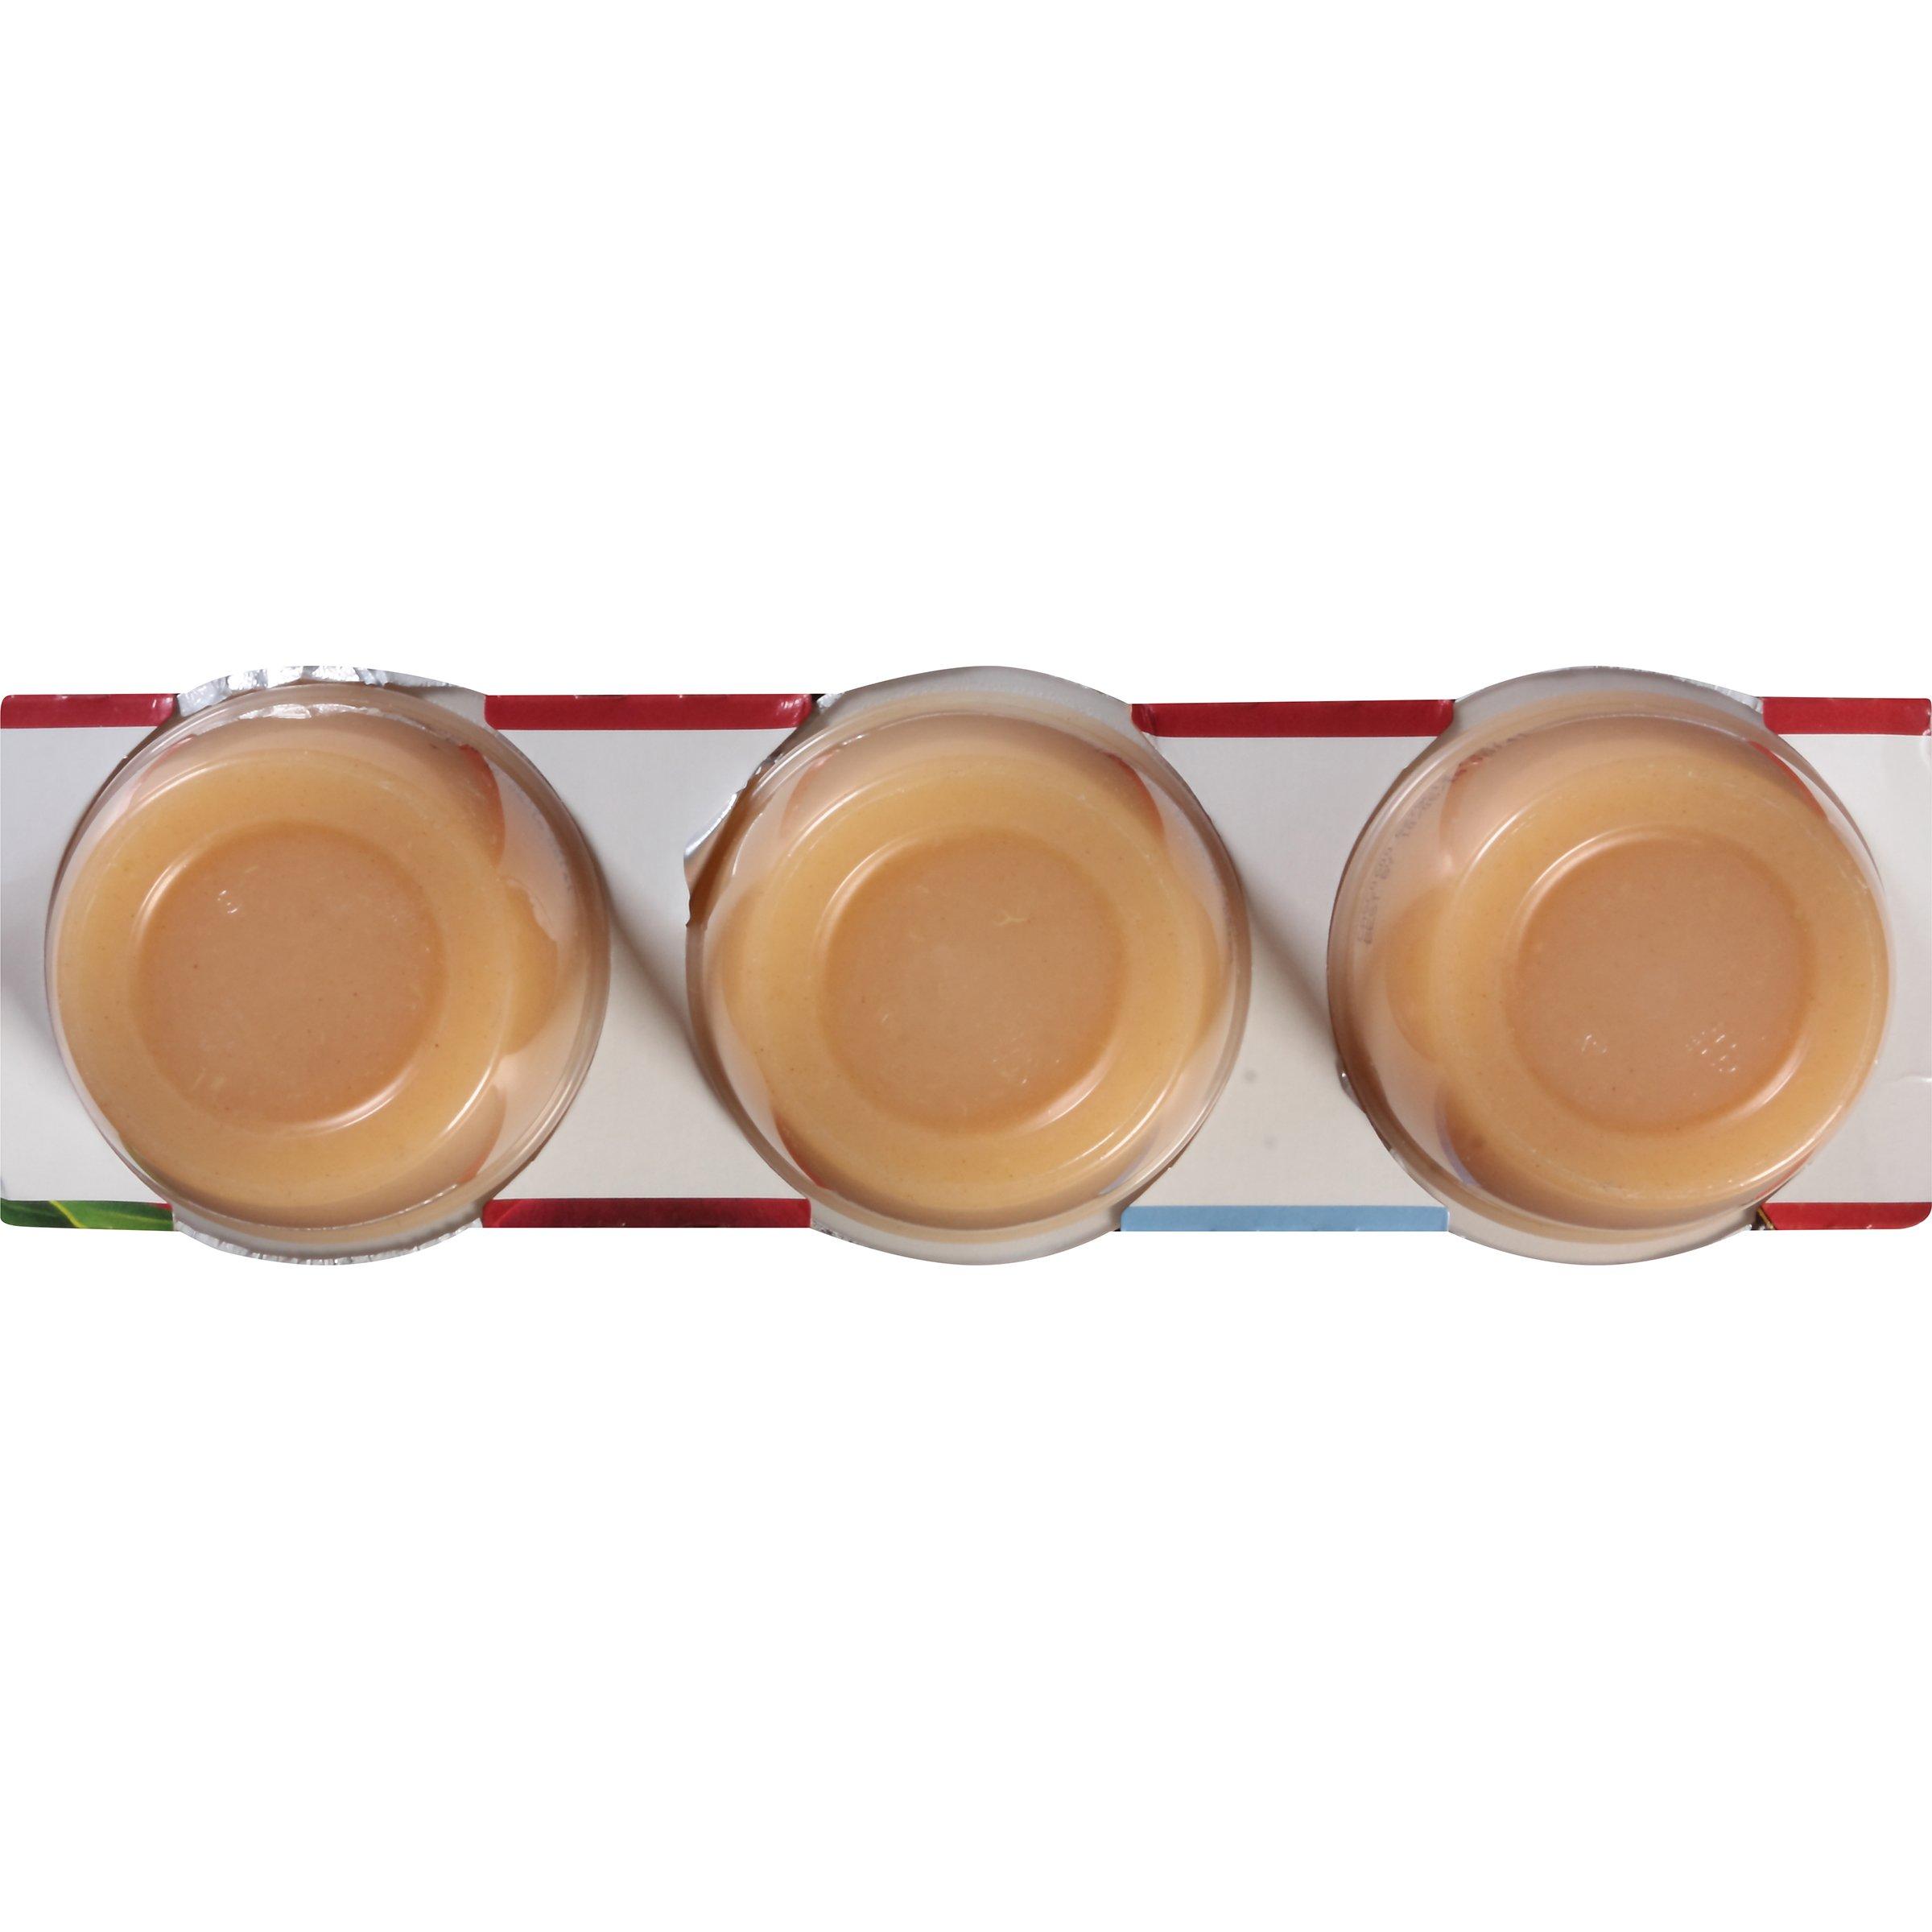 Musselman's Lite Cinnamon Apple Sauce, 4 Ounce (Pack of 12) by Musselmans (Image #3)